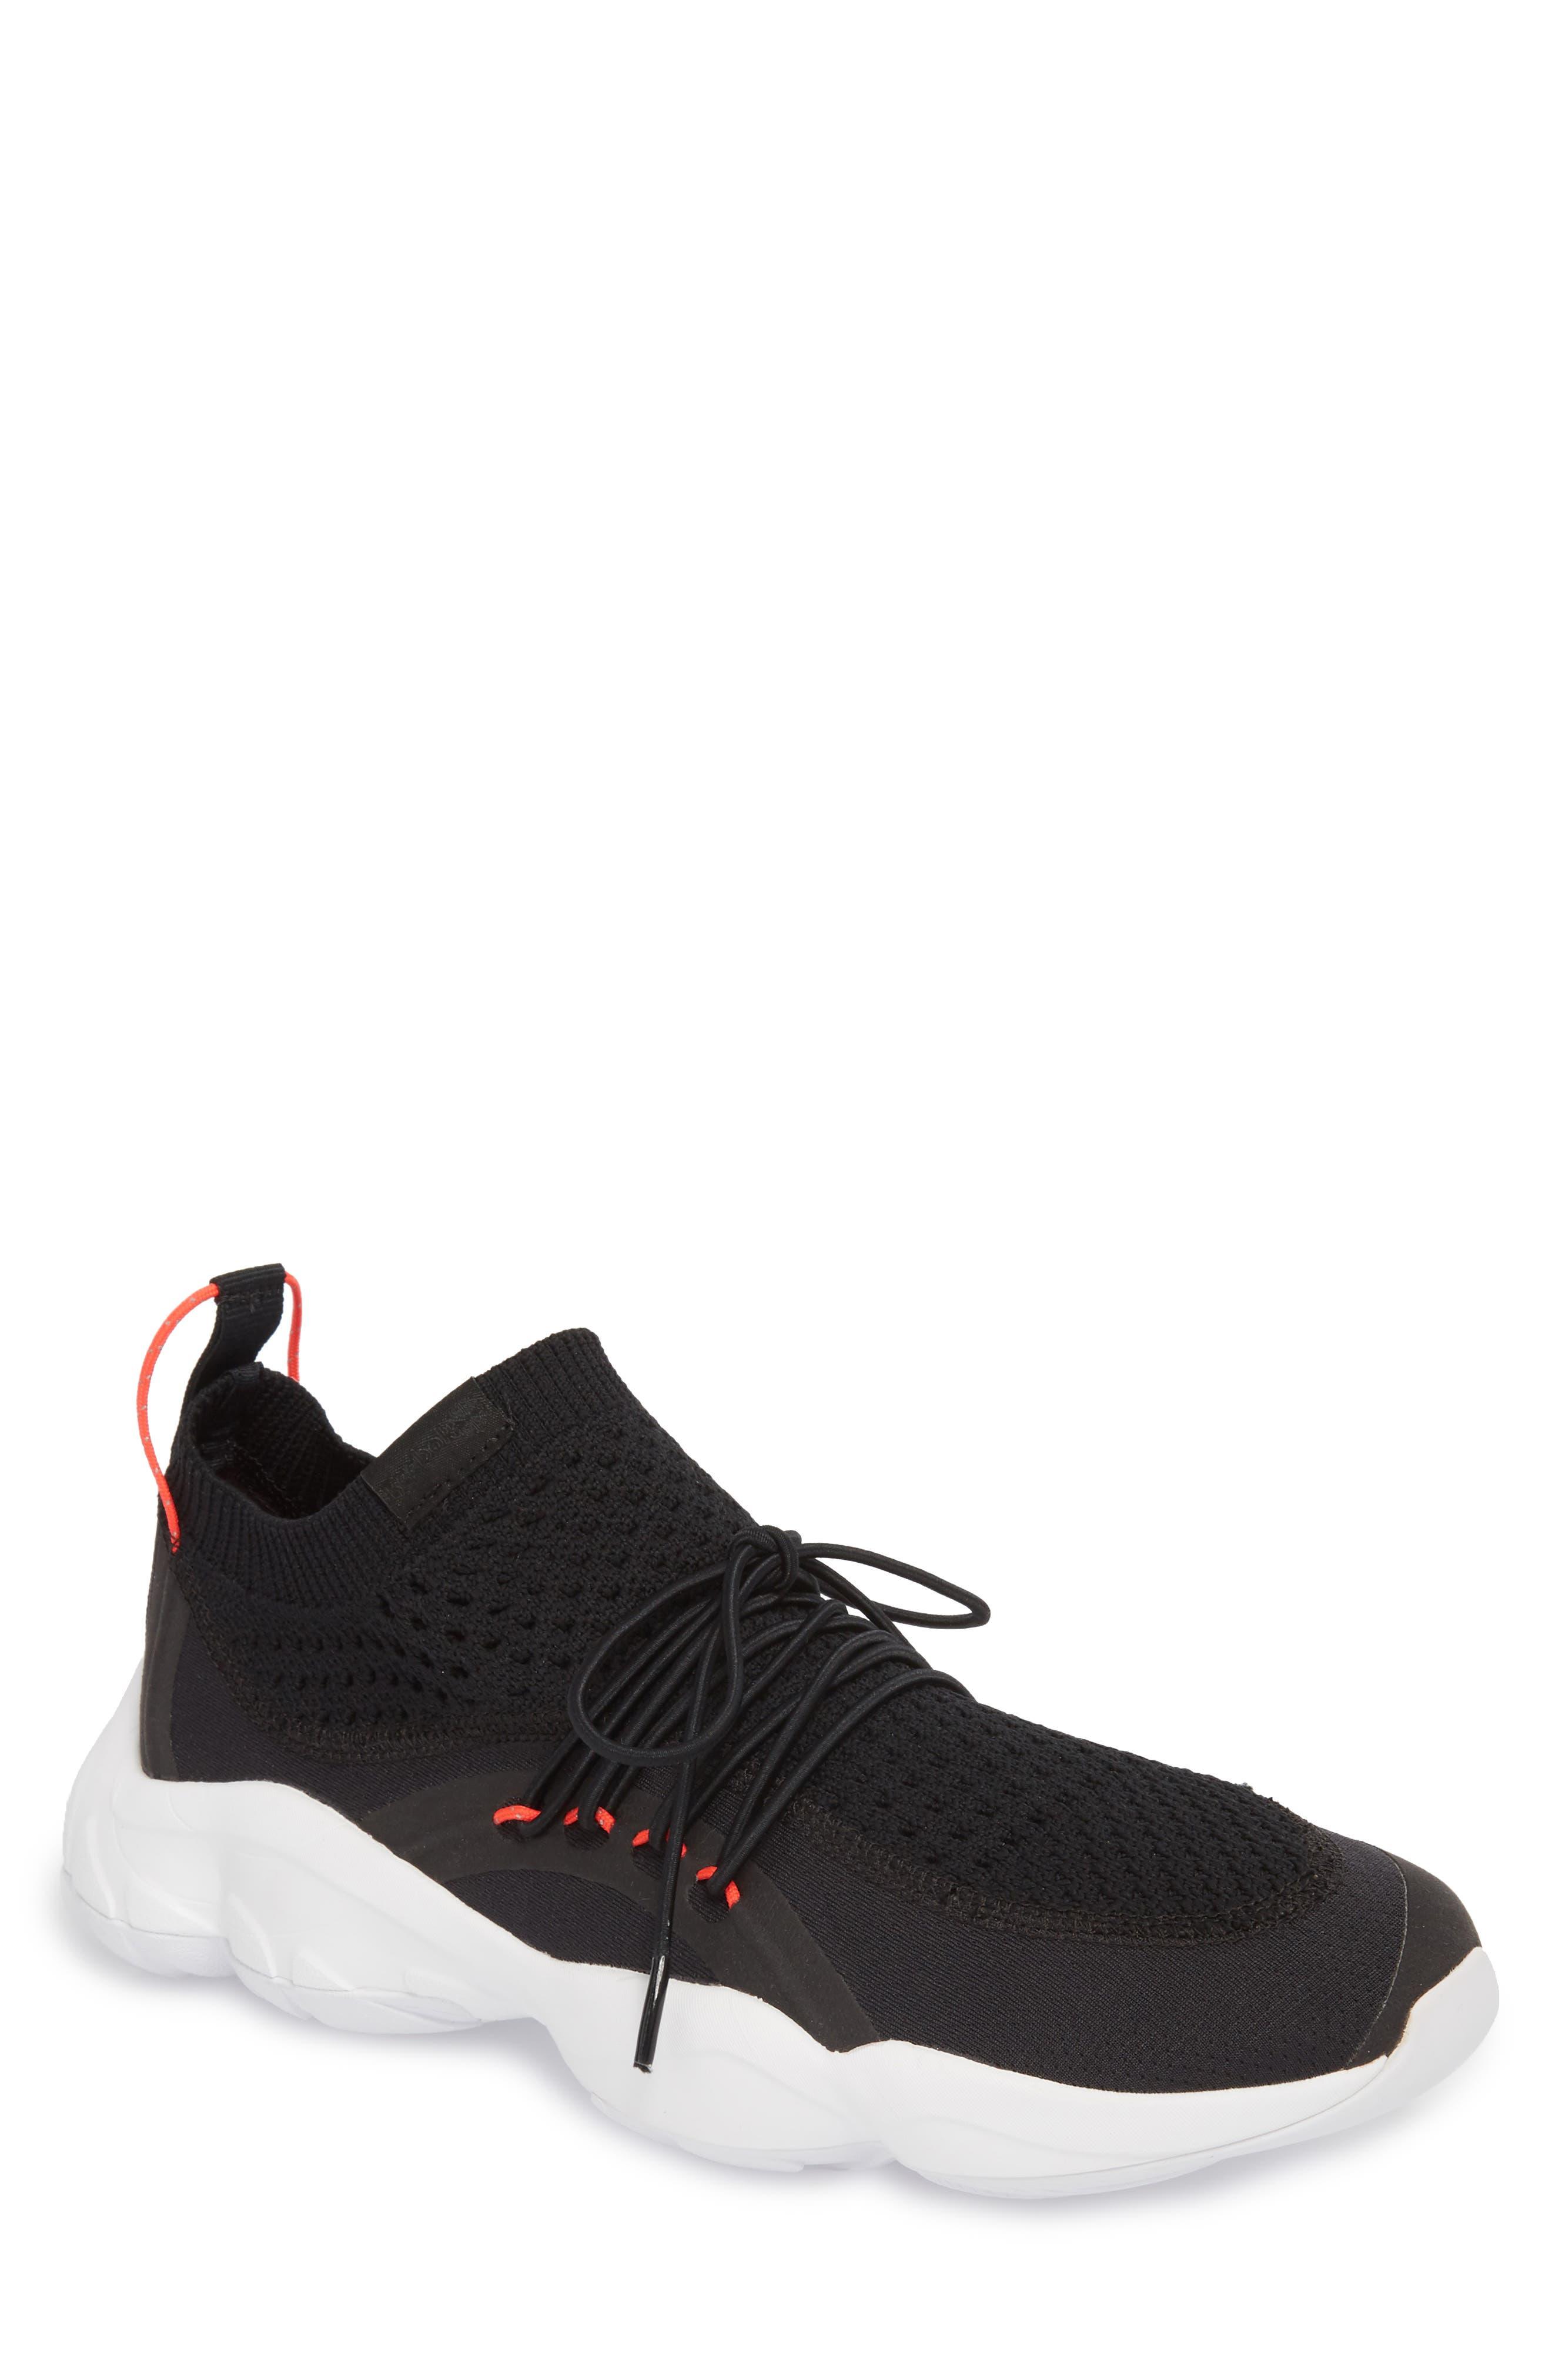 Reebok DMX Fusion NR Sneaker (Men)